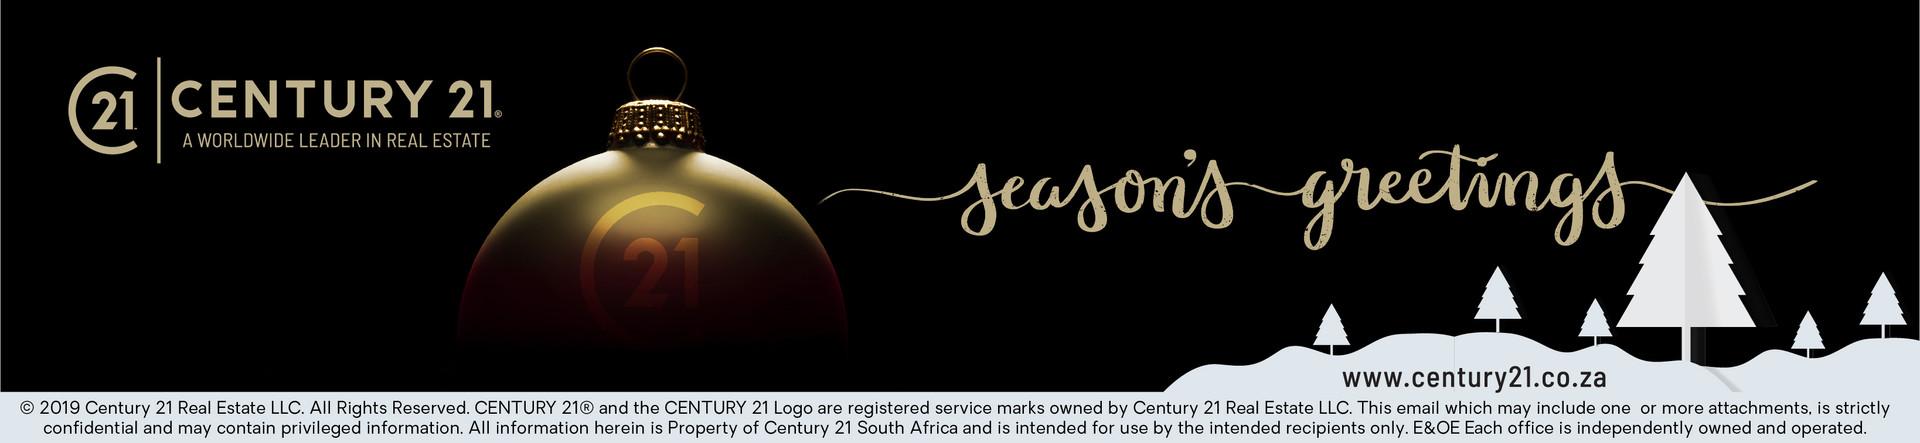 Christmas_Signature-01.jpg